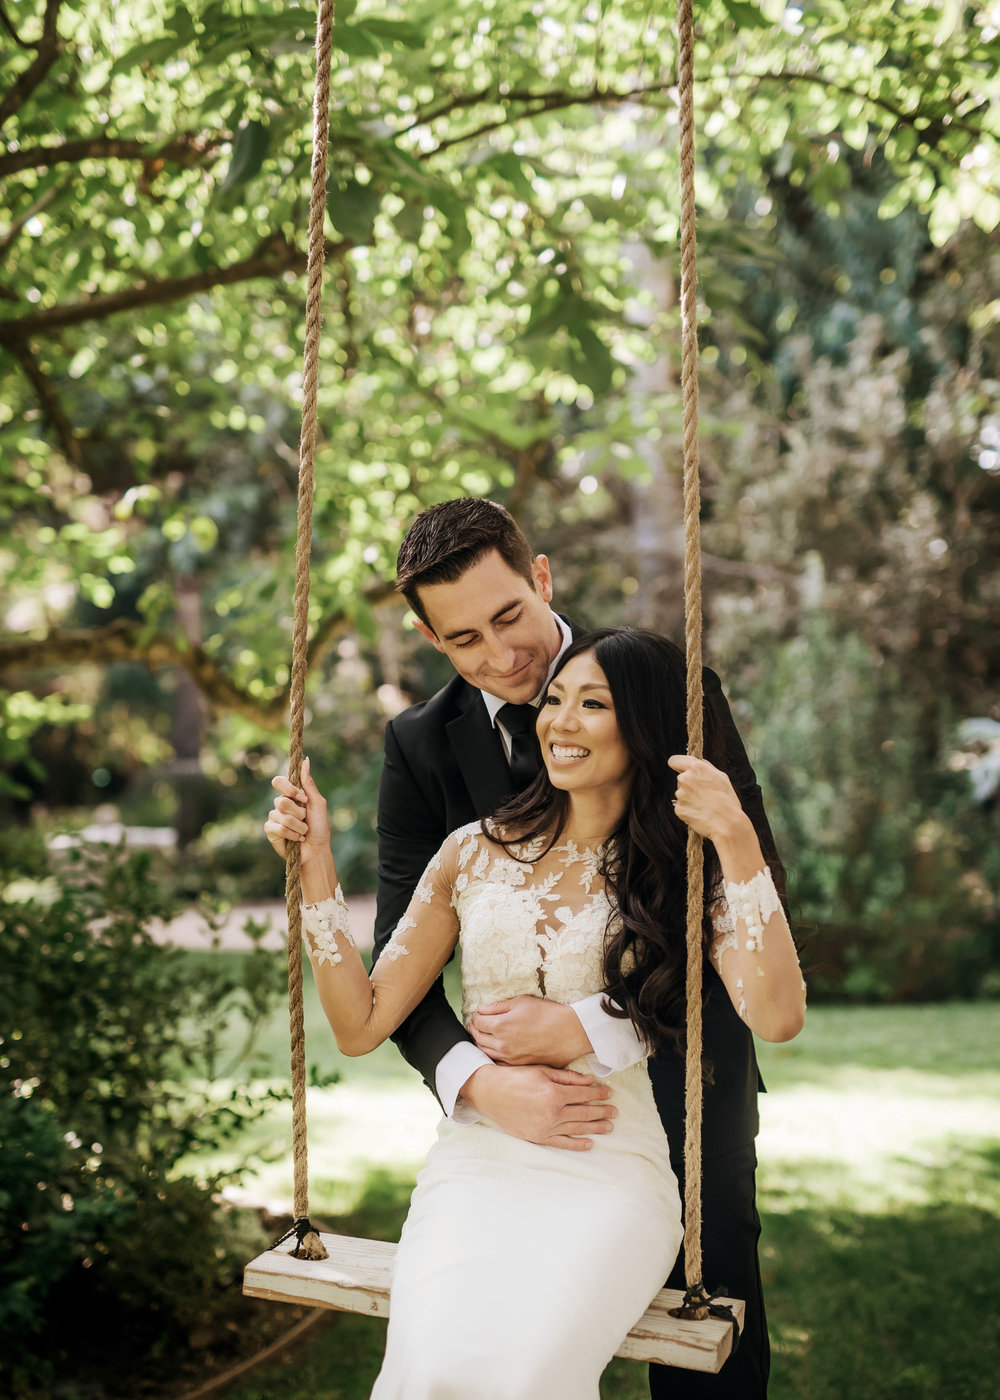 Turchin_20180825_Austinae-Brent-Wedding_134.jpg